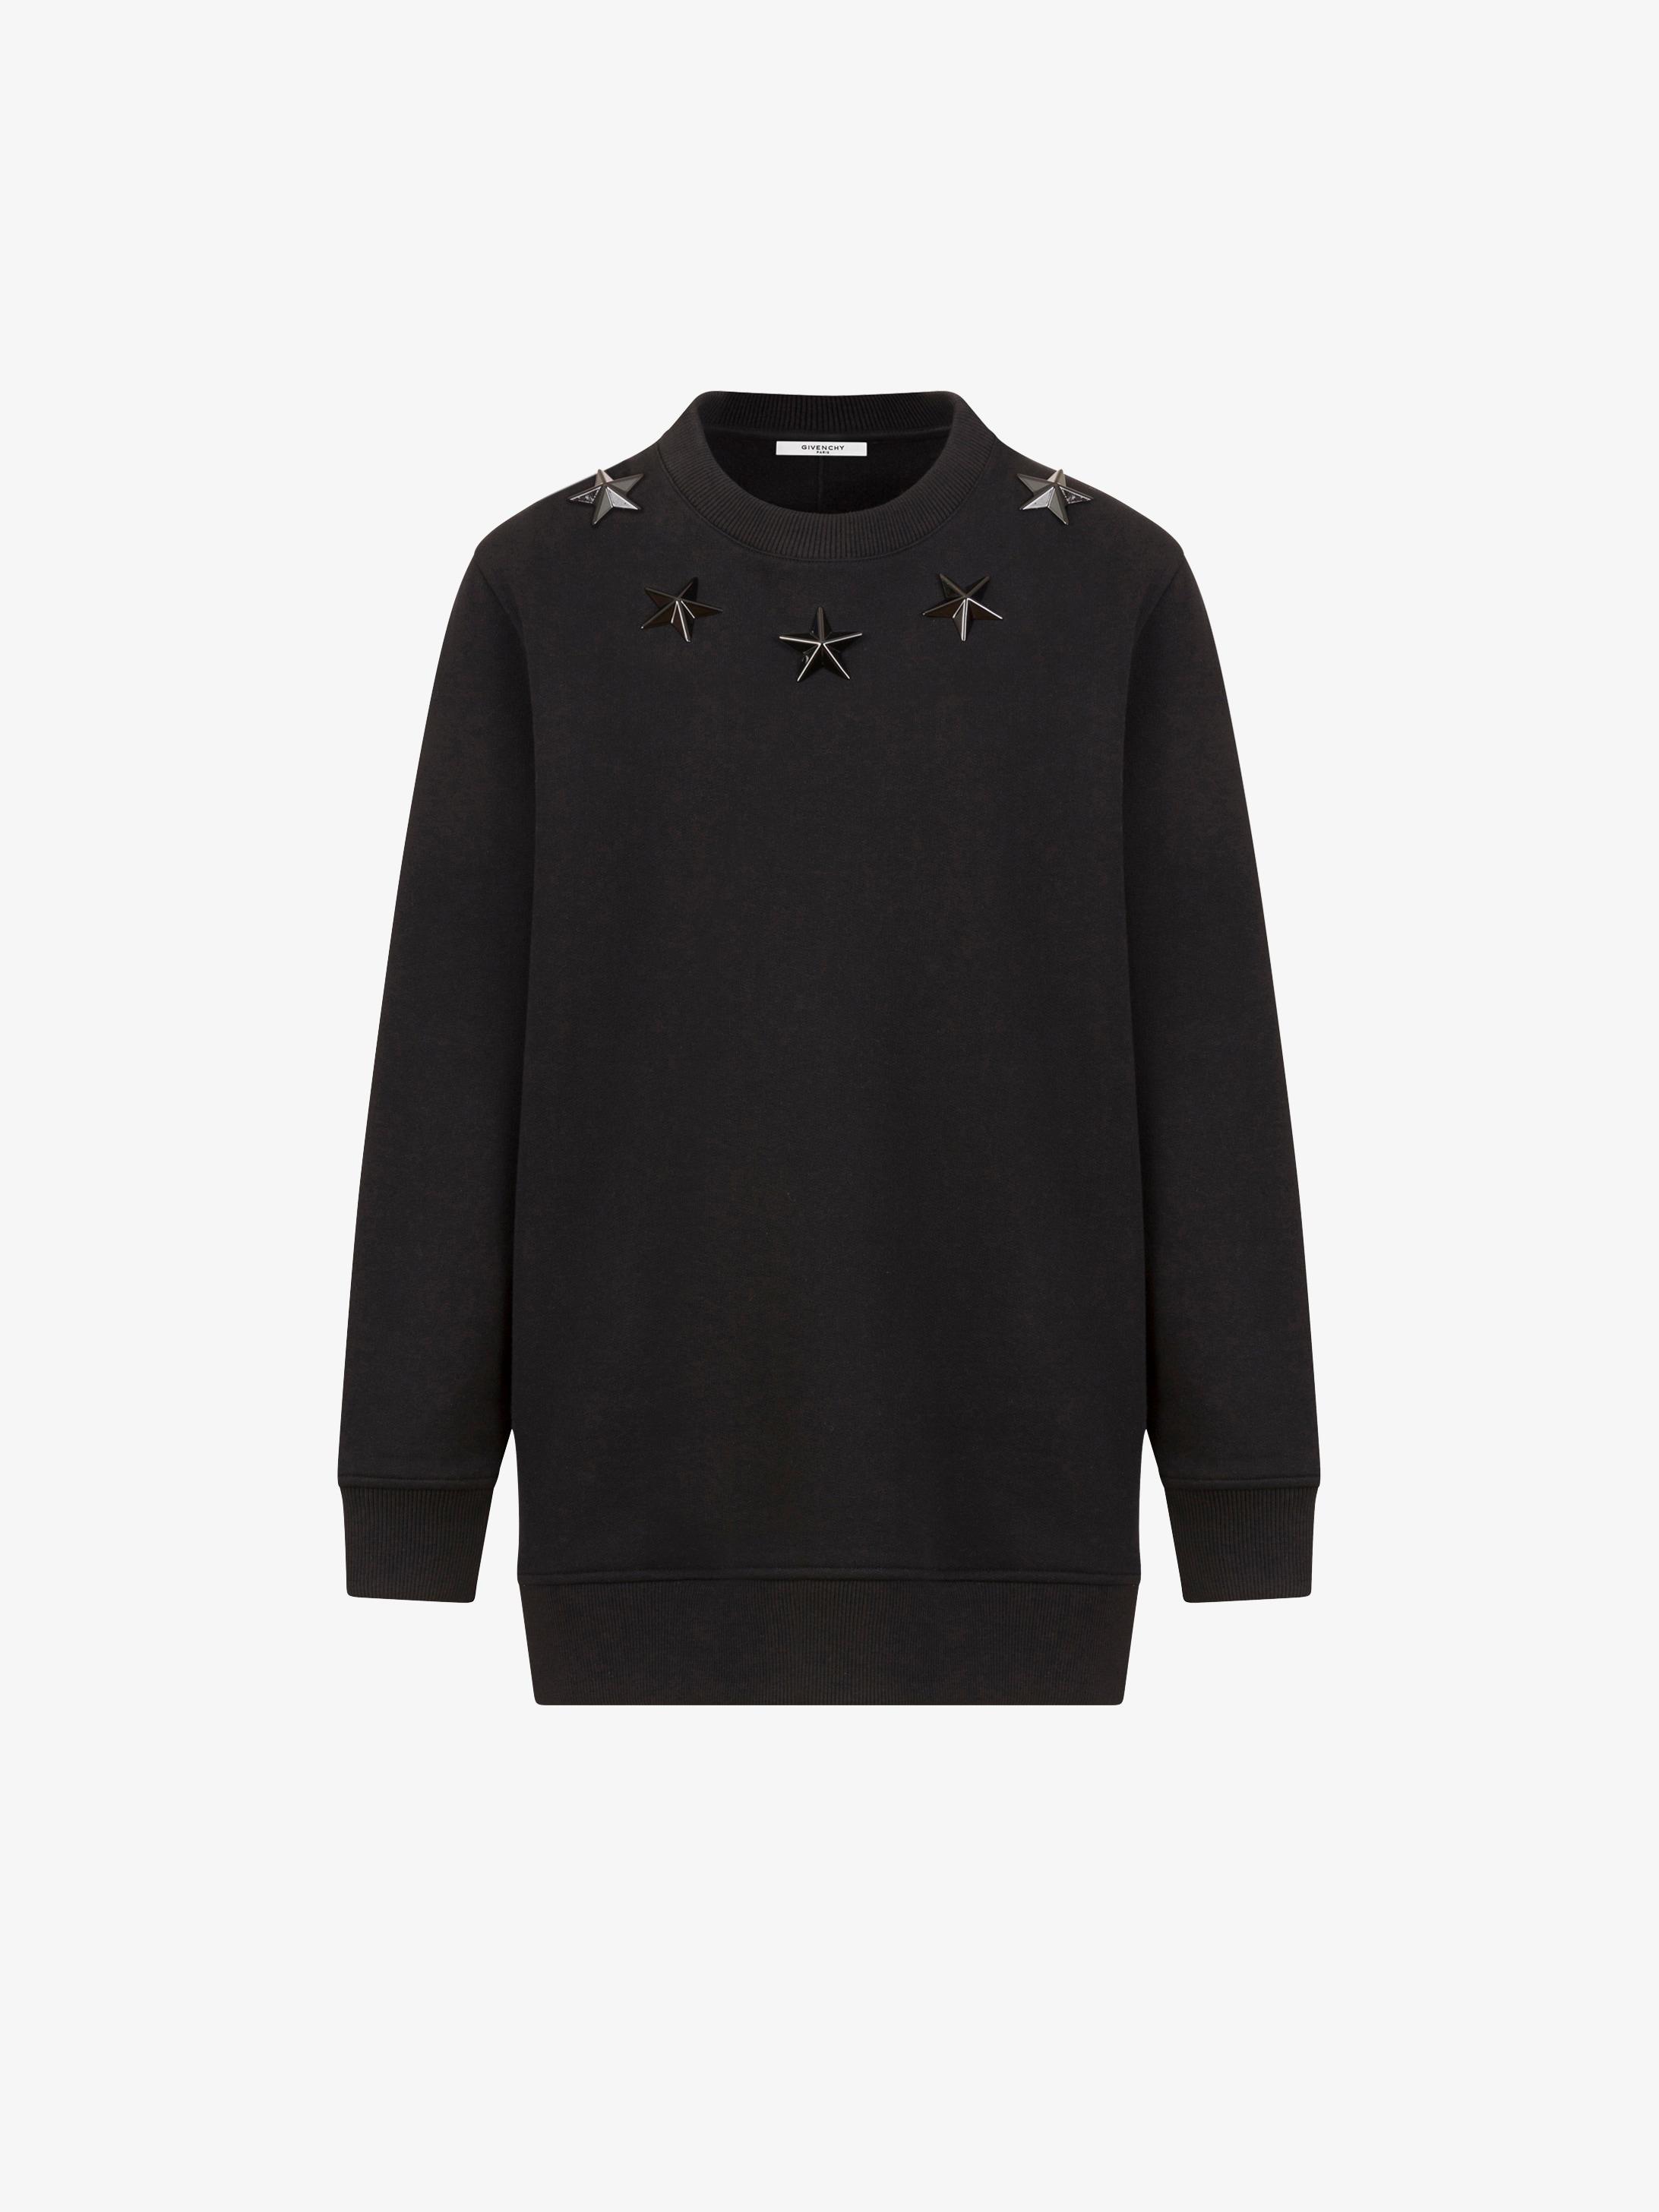 3ecfc730b3be Givenchy Stars embroidered Sweatshirt